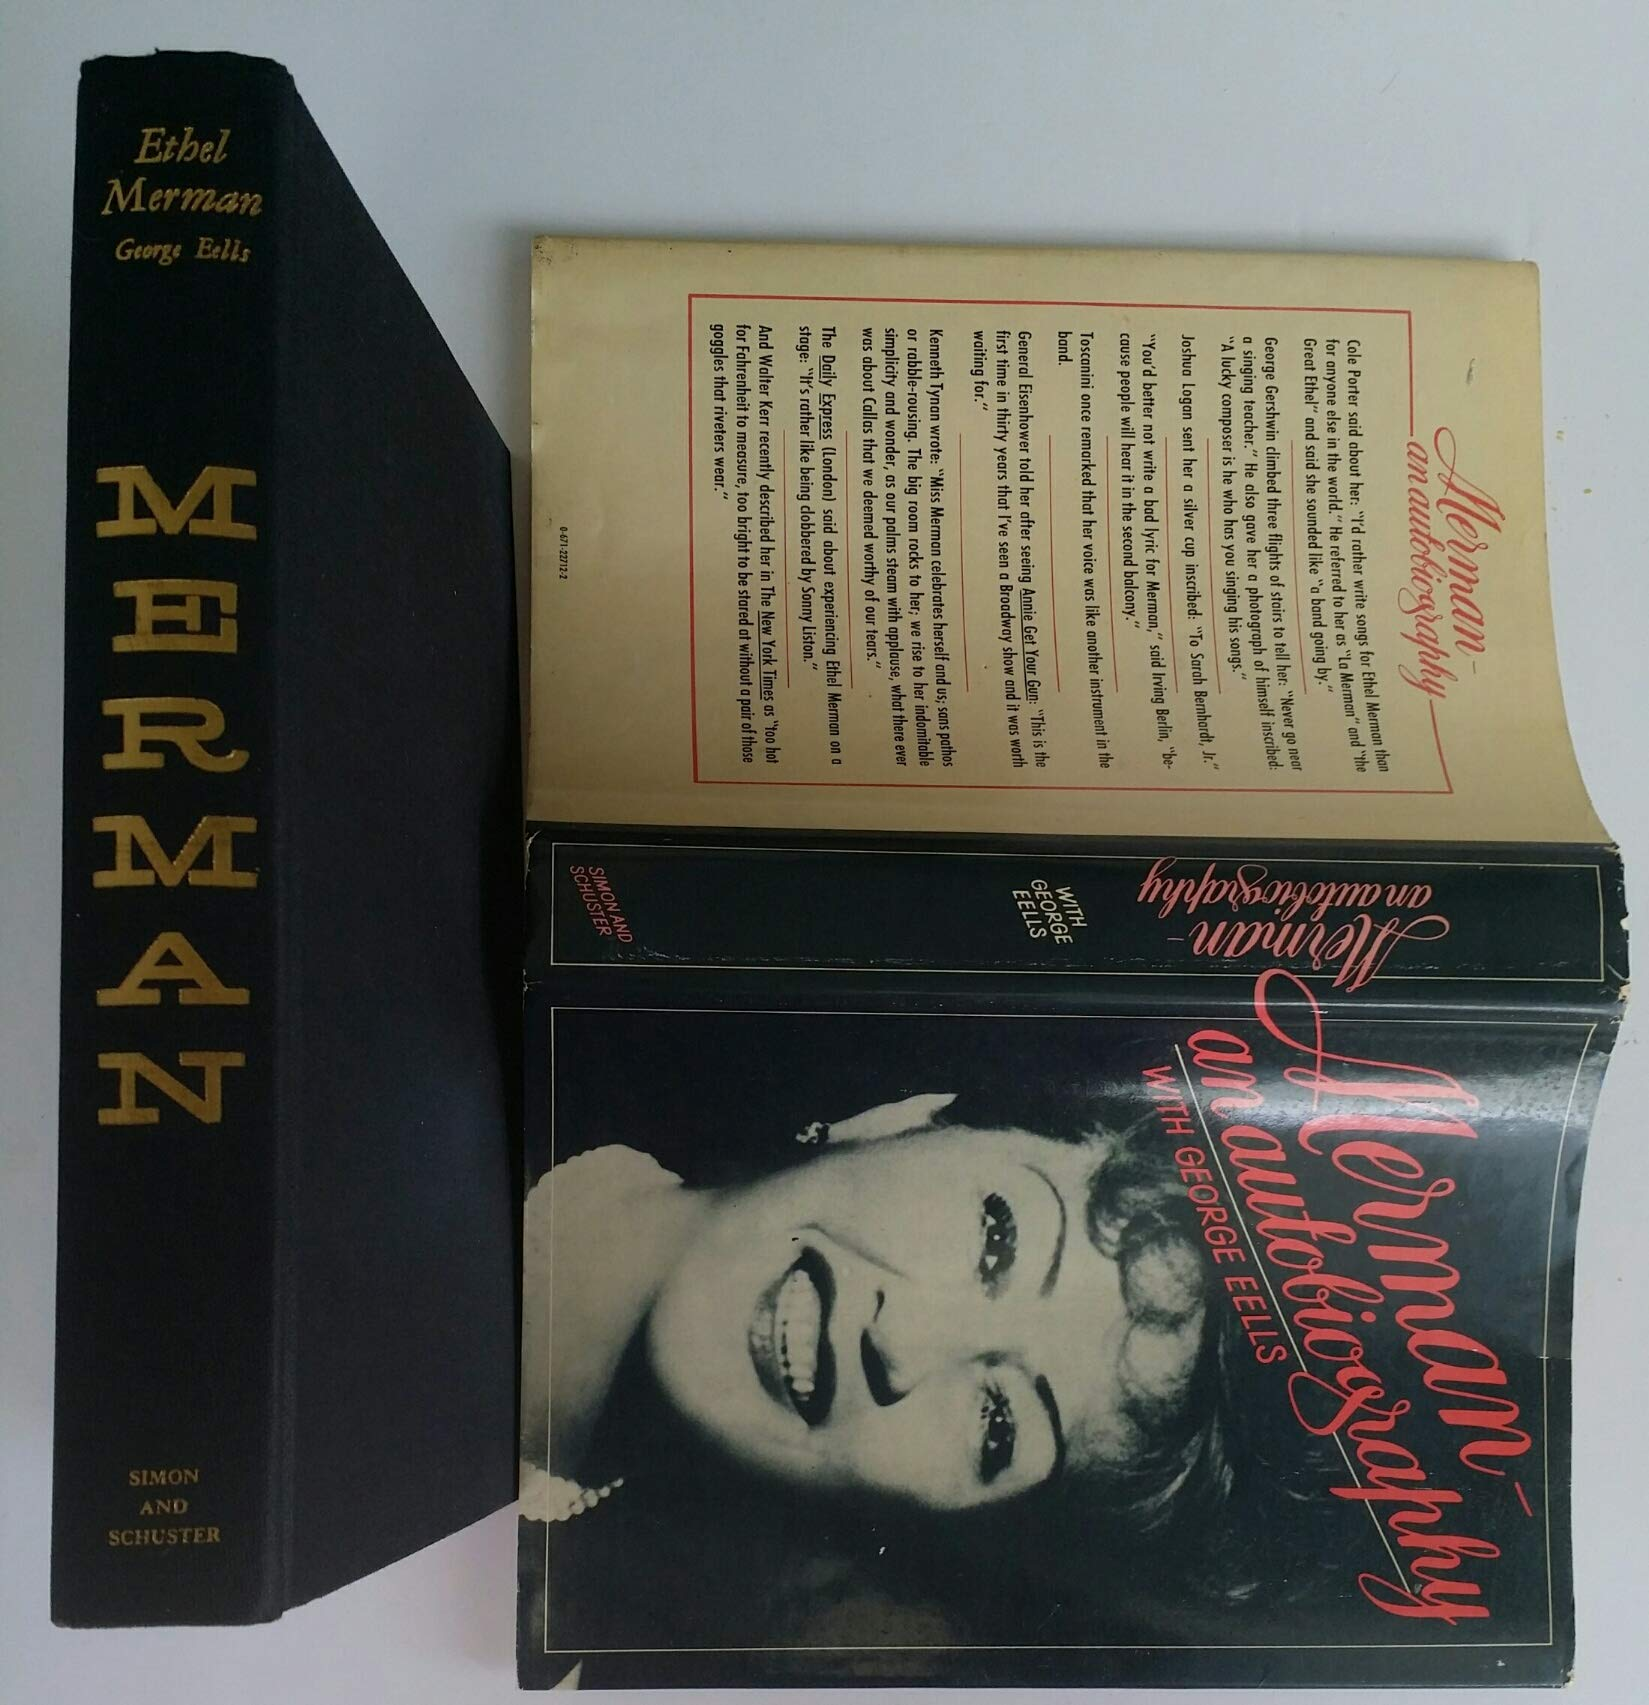 bc65e4adf66 Merman: Ethel merman & george eel: 9780671227128: Amazon.com: Books